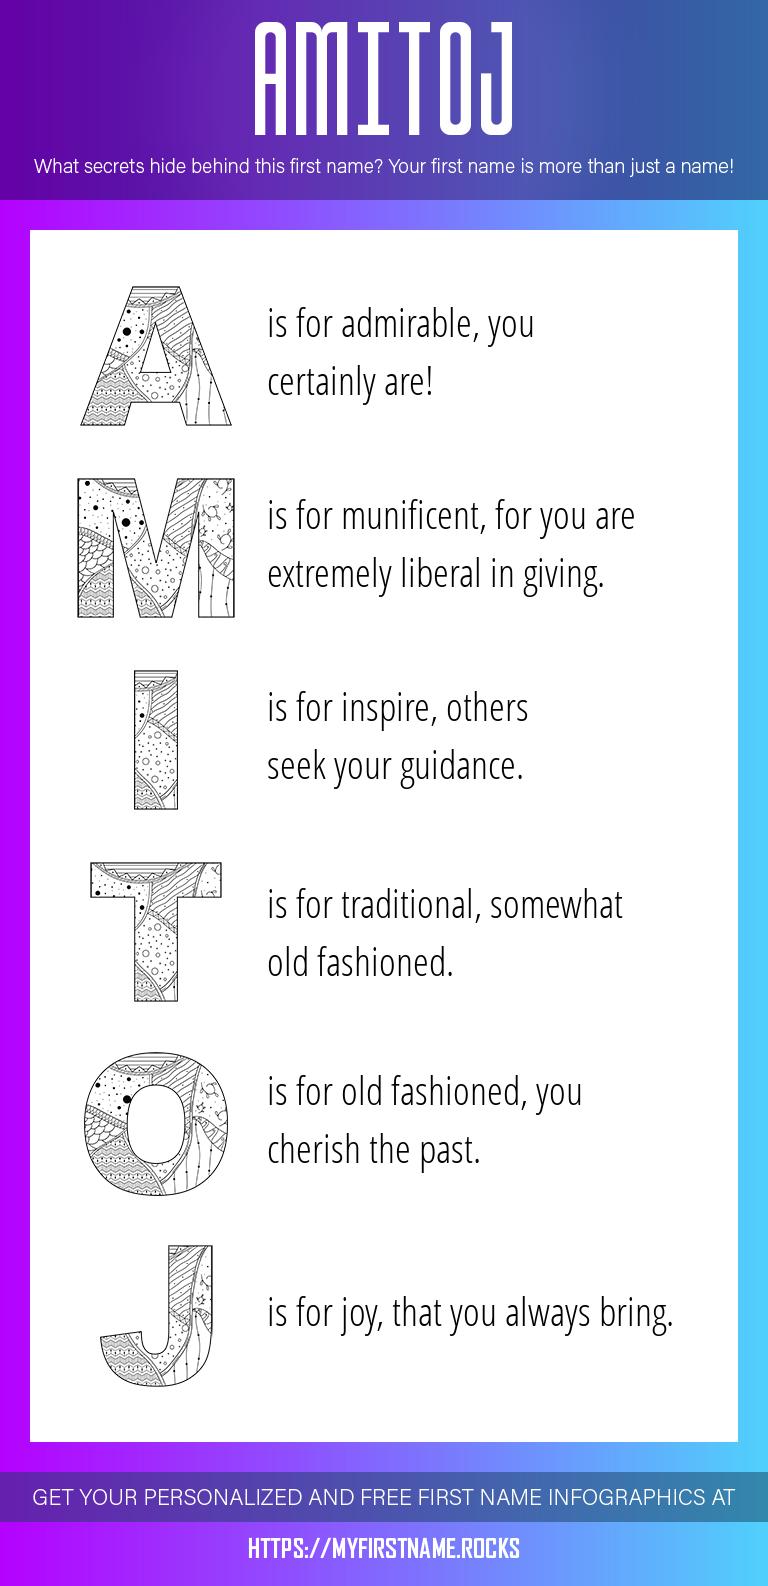 Amitoj Infographics